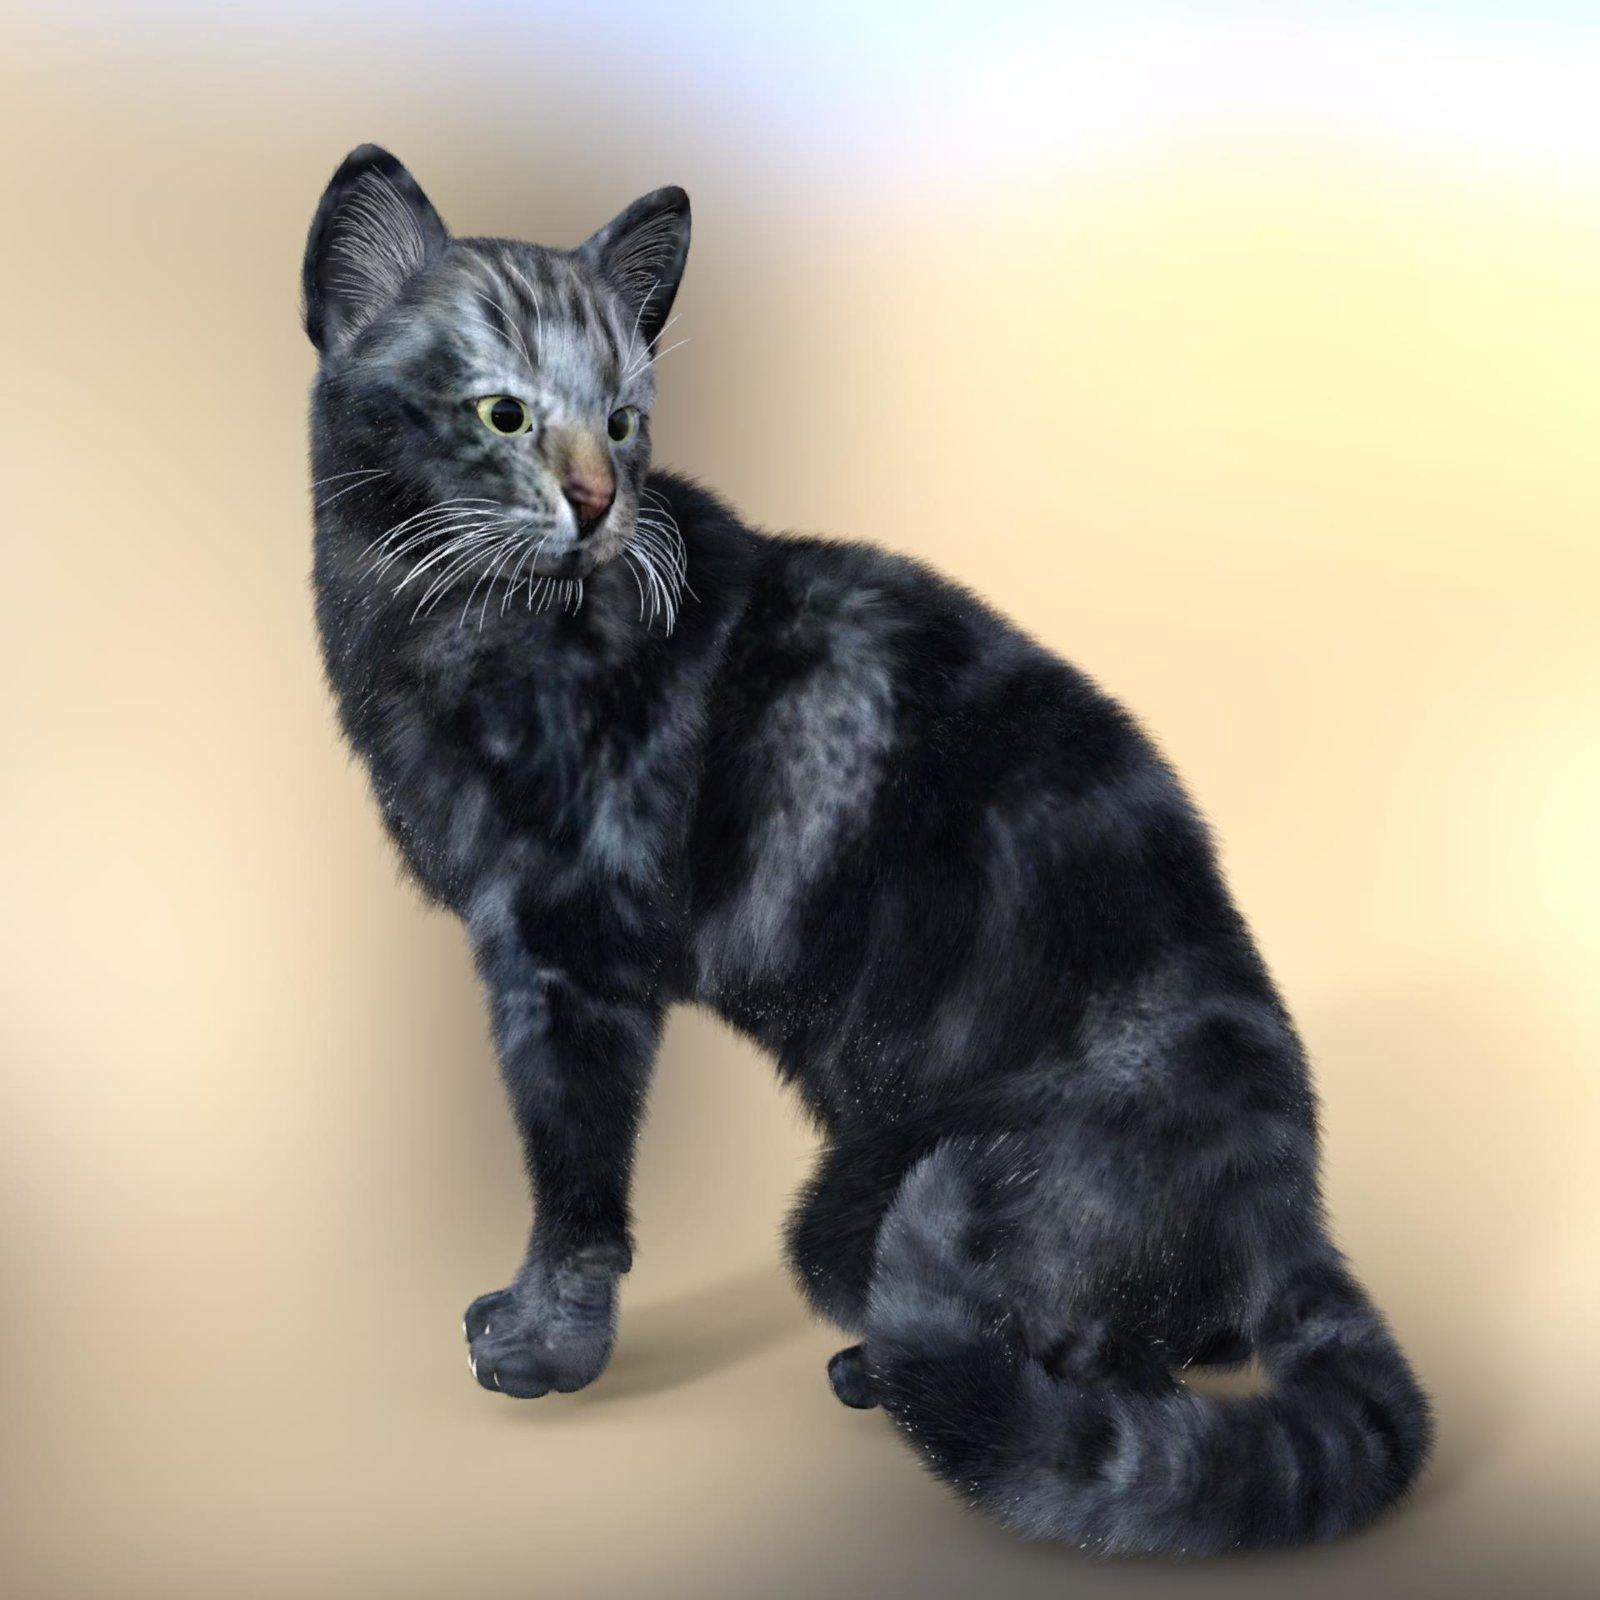 Furry LynxOut.jpg